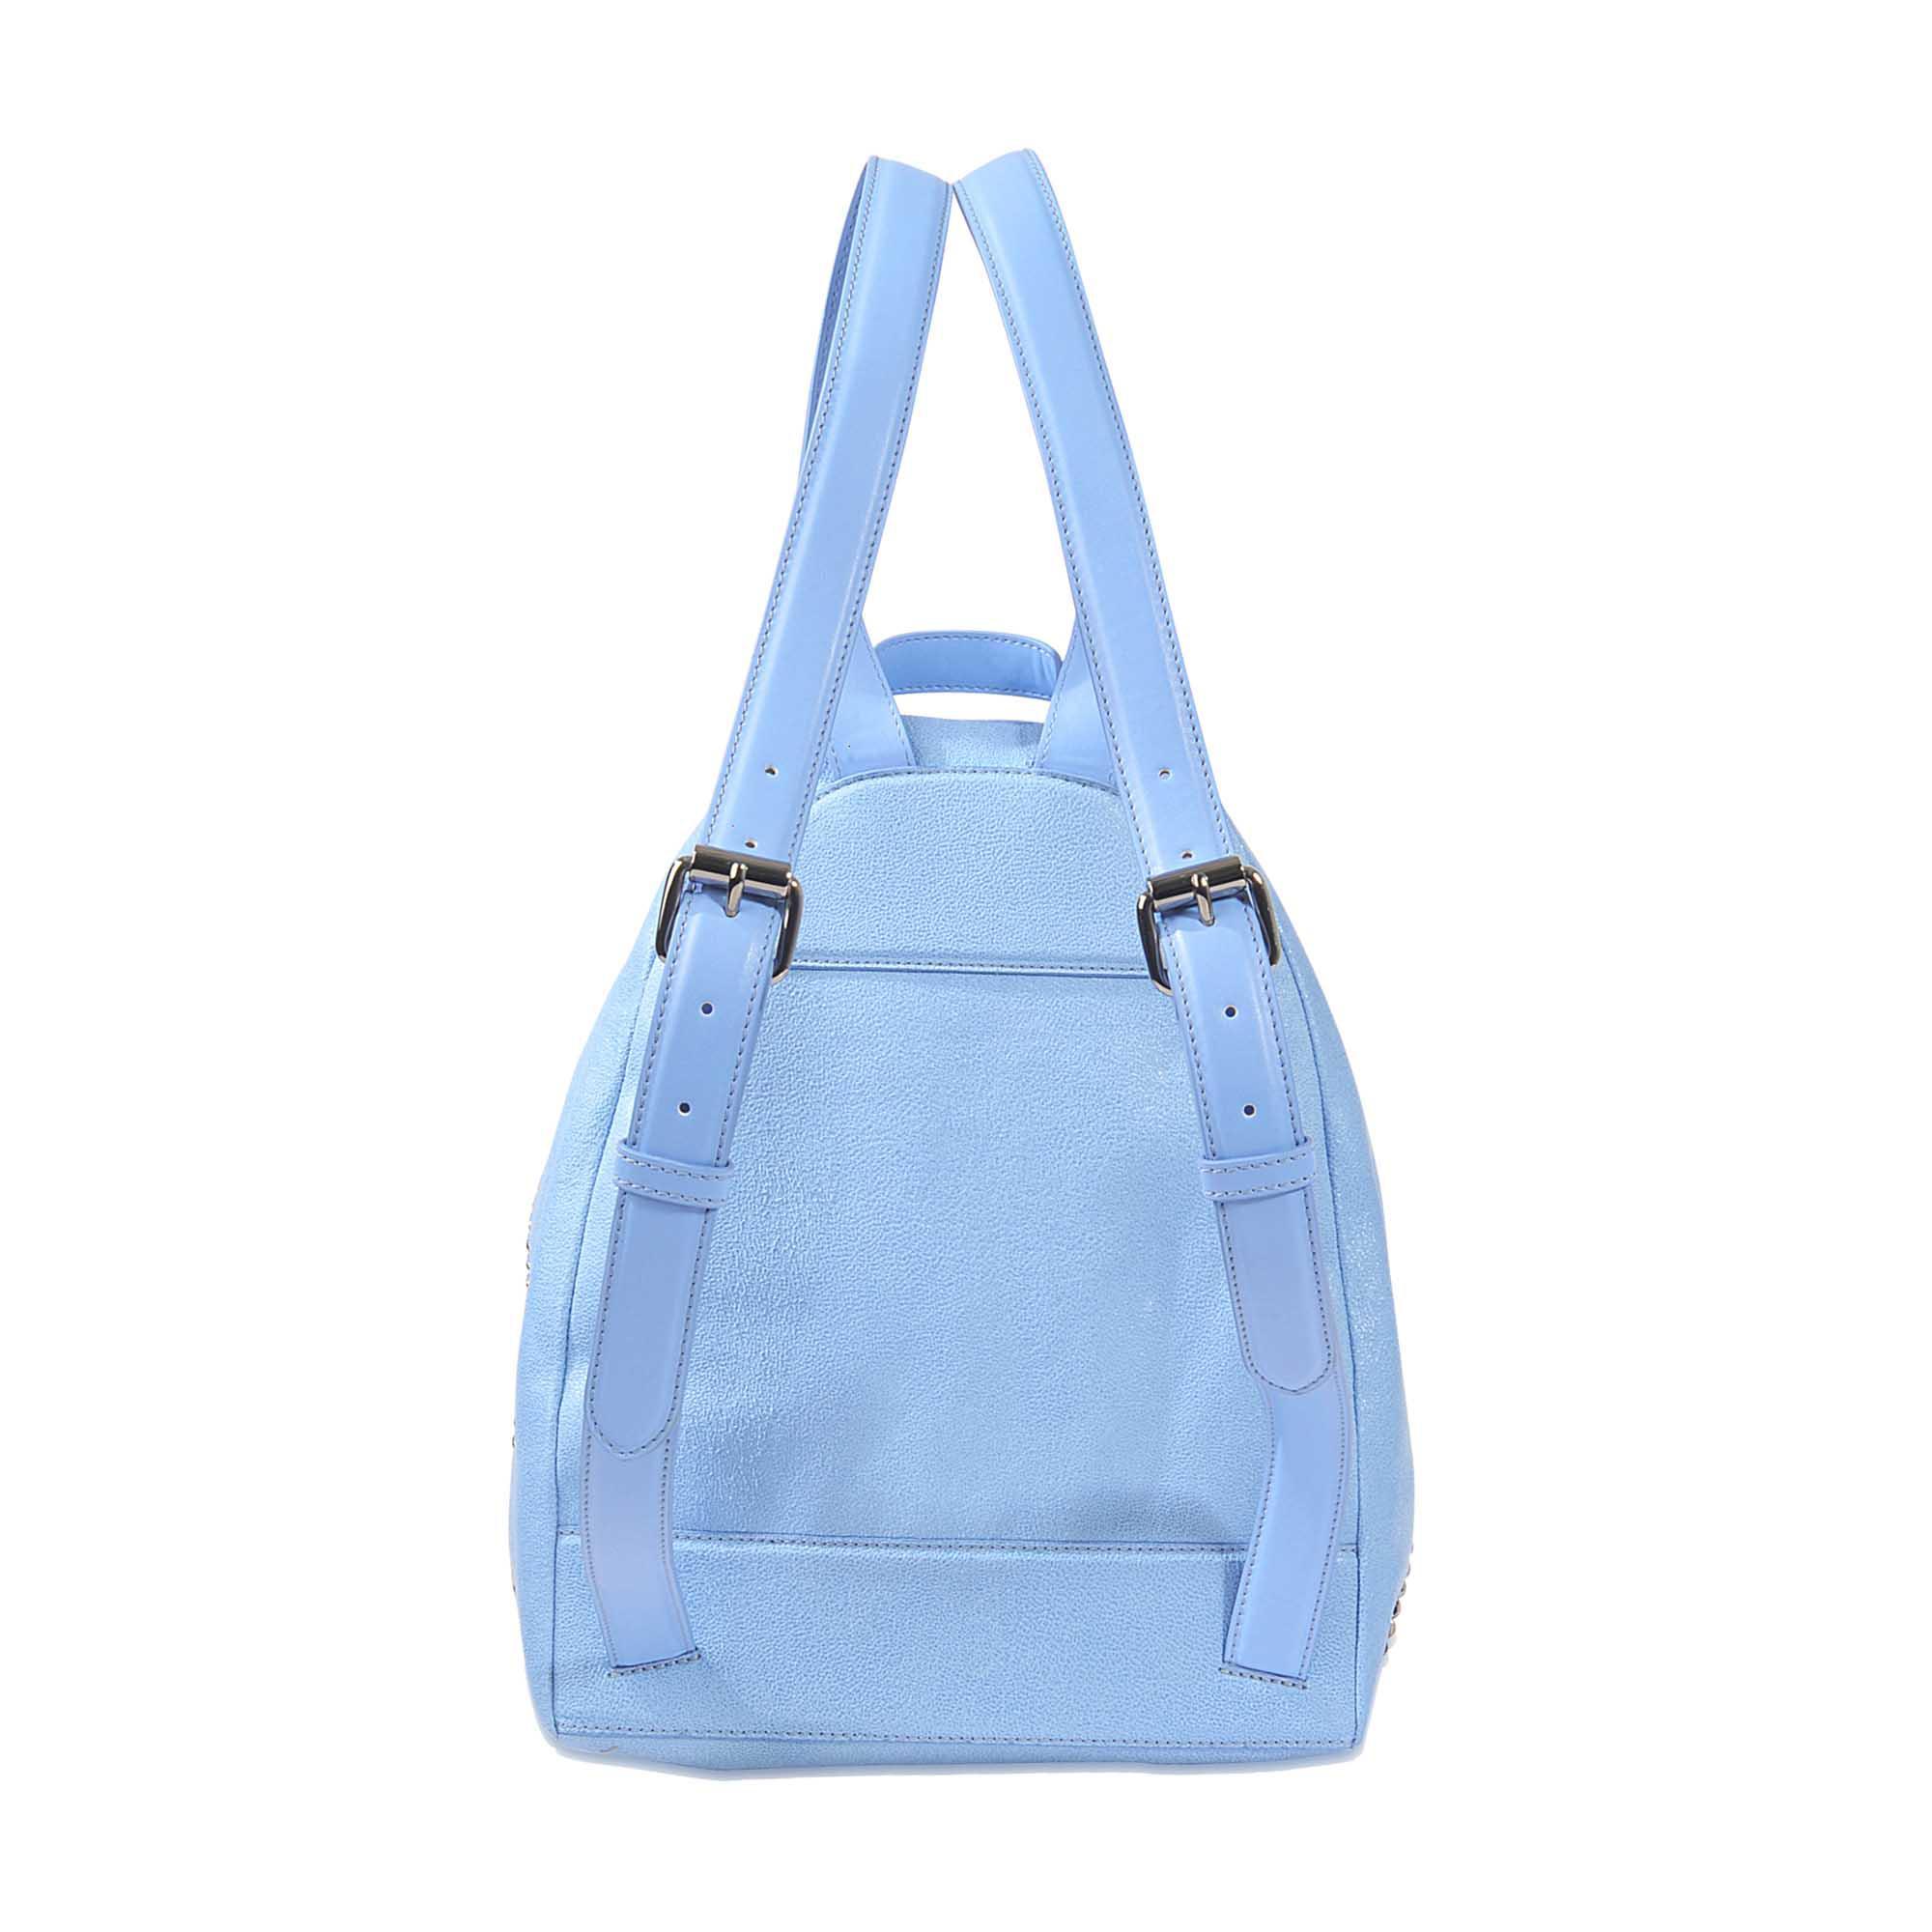 7da4804423b1 Gallery. Women s Stella Mccartney Falabella Women s Mini Backpack ...